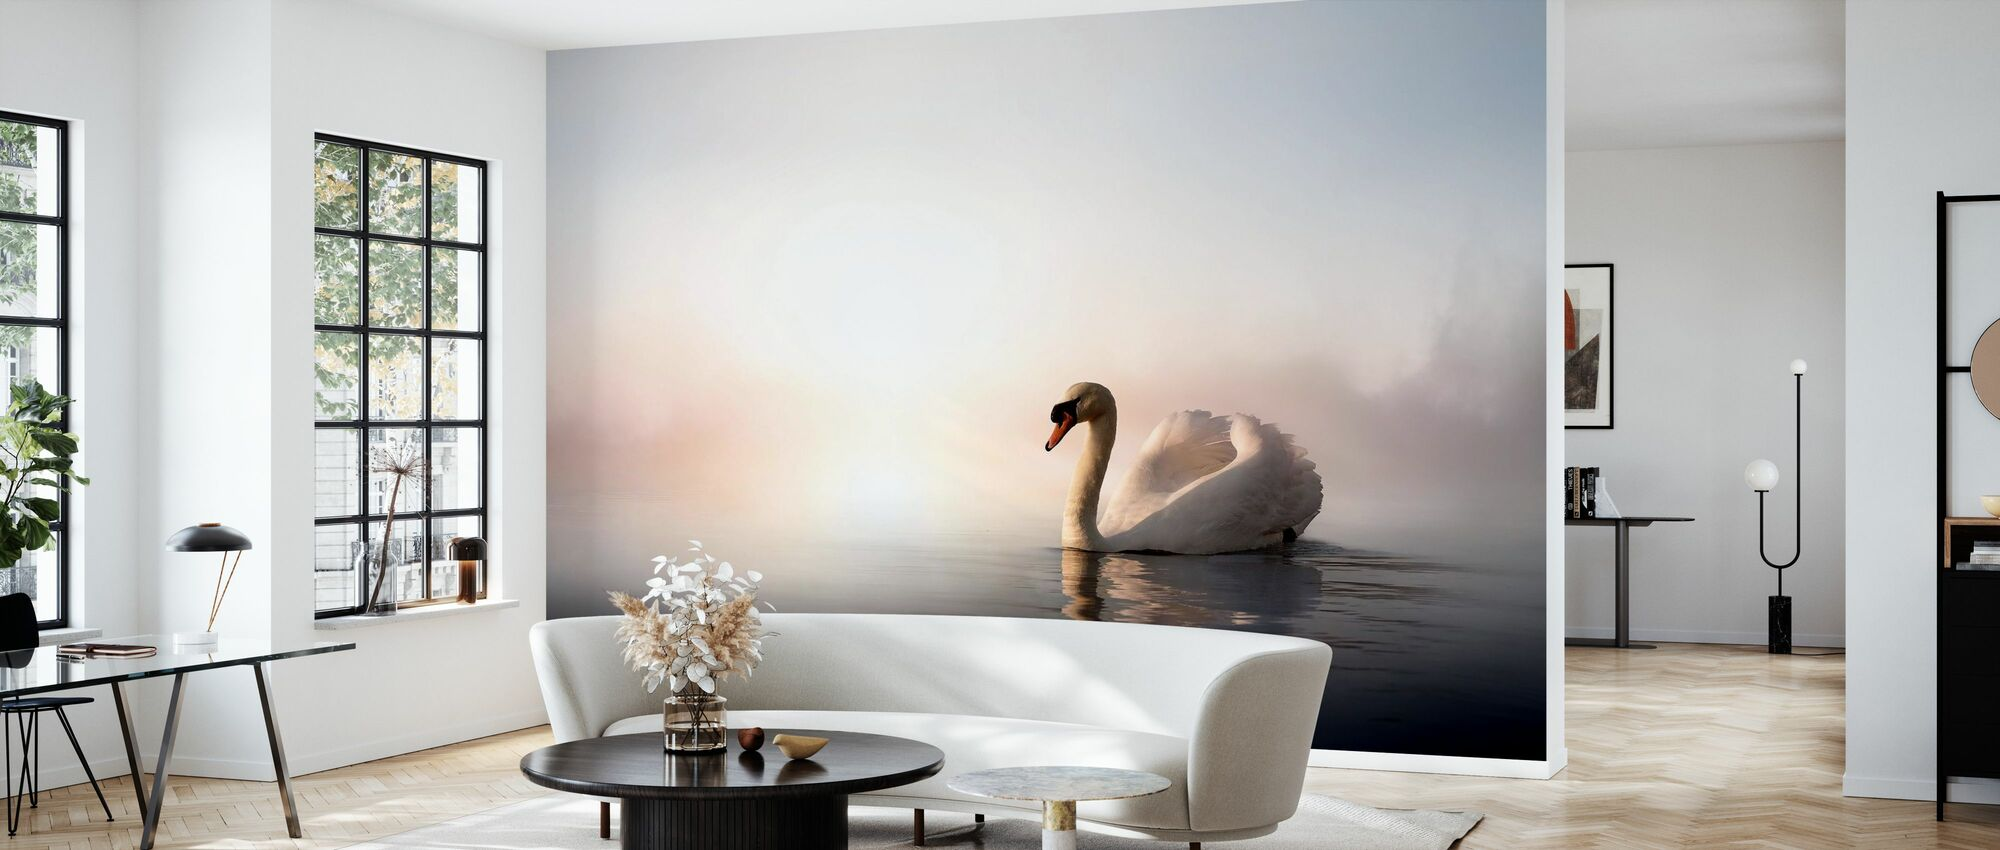 Swan Floating - Wallpaper - Living Room